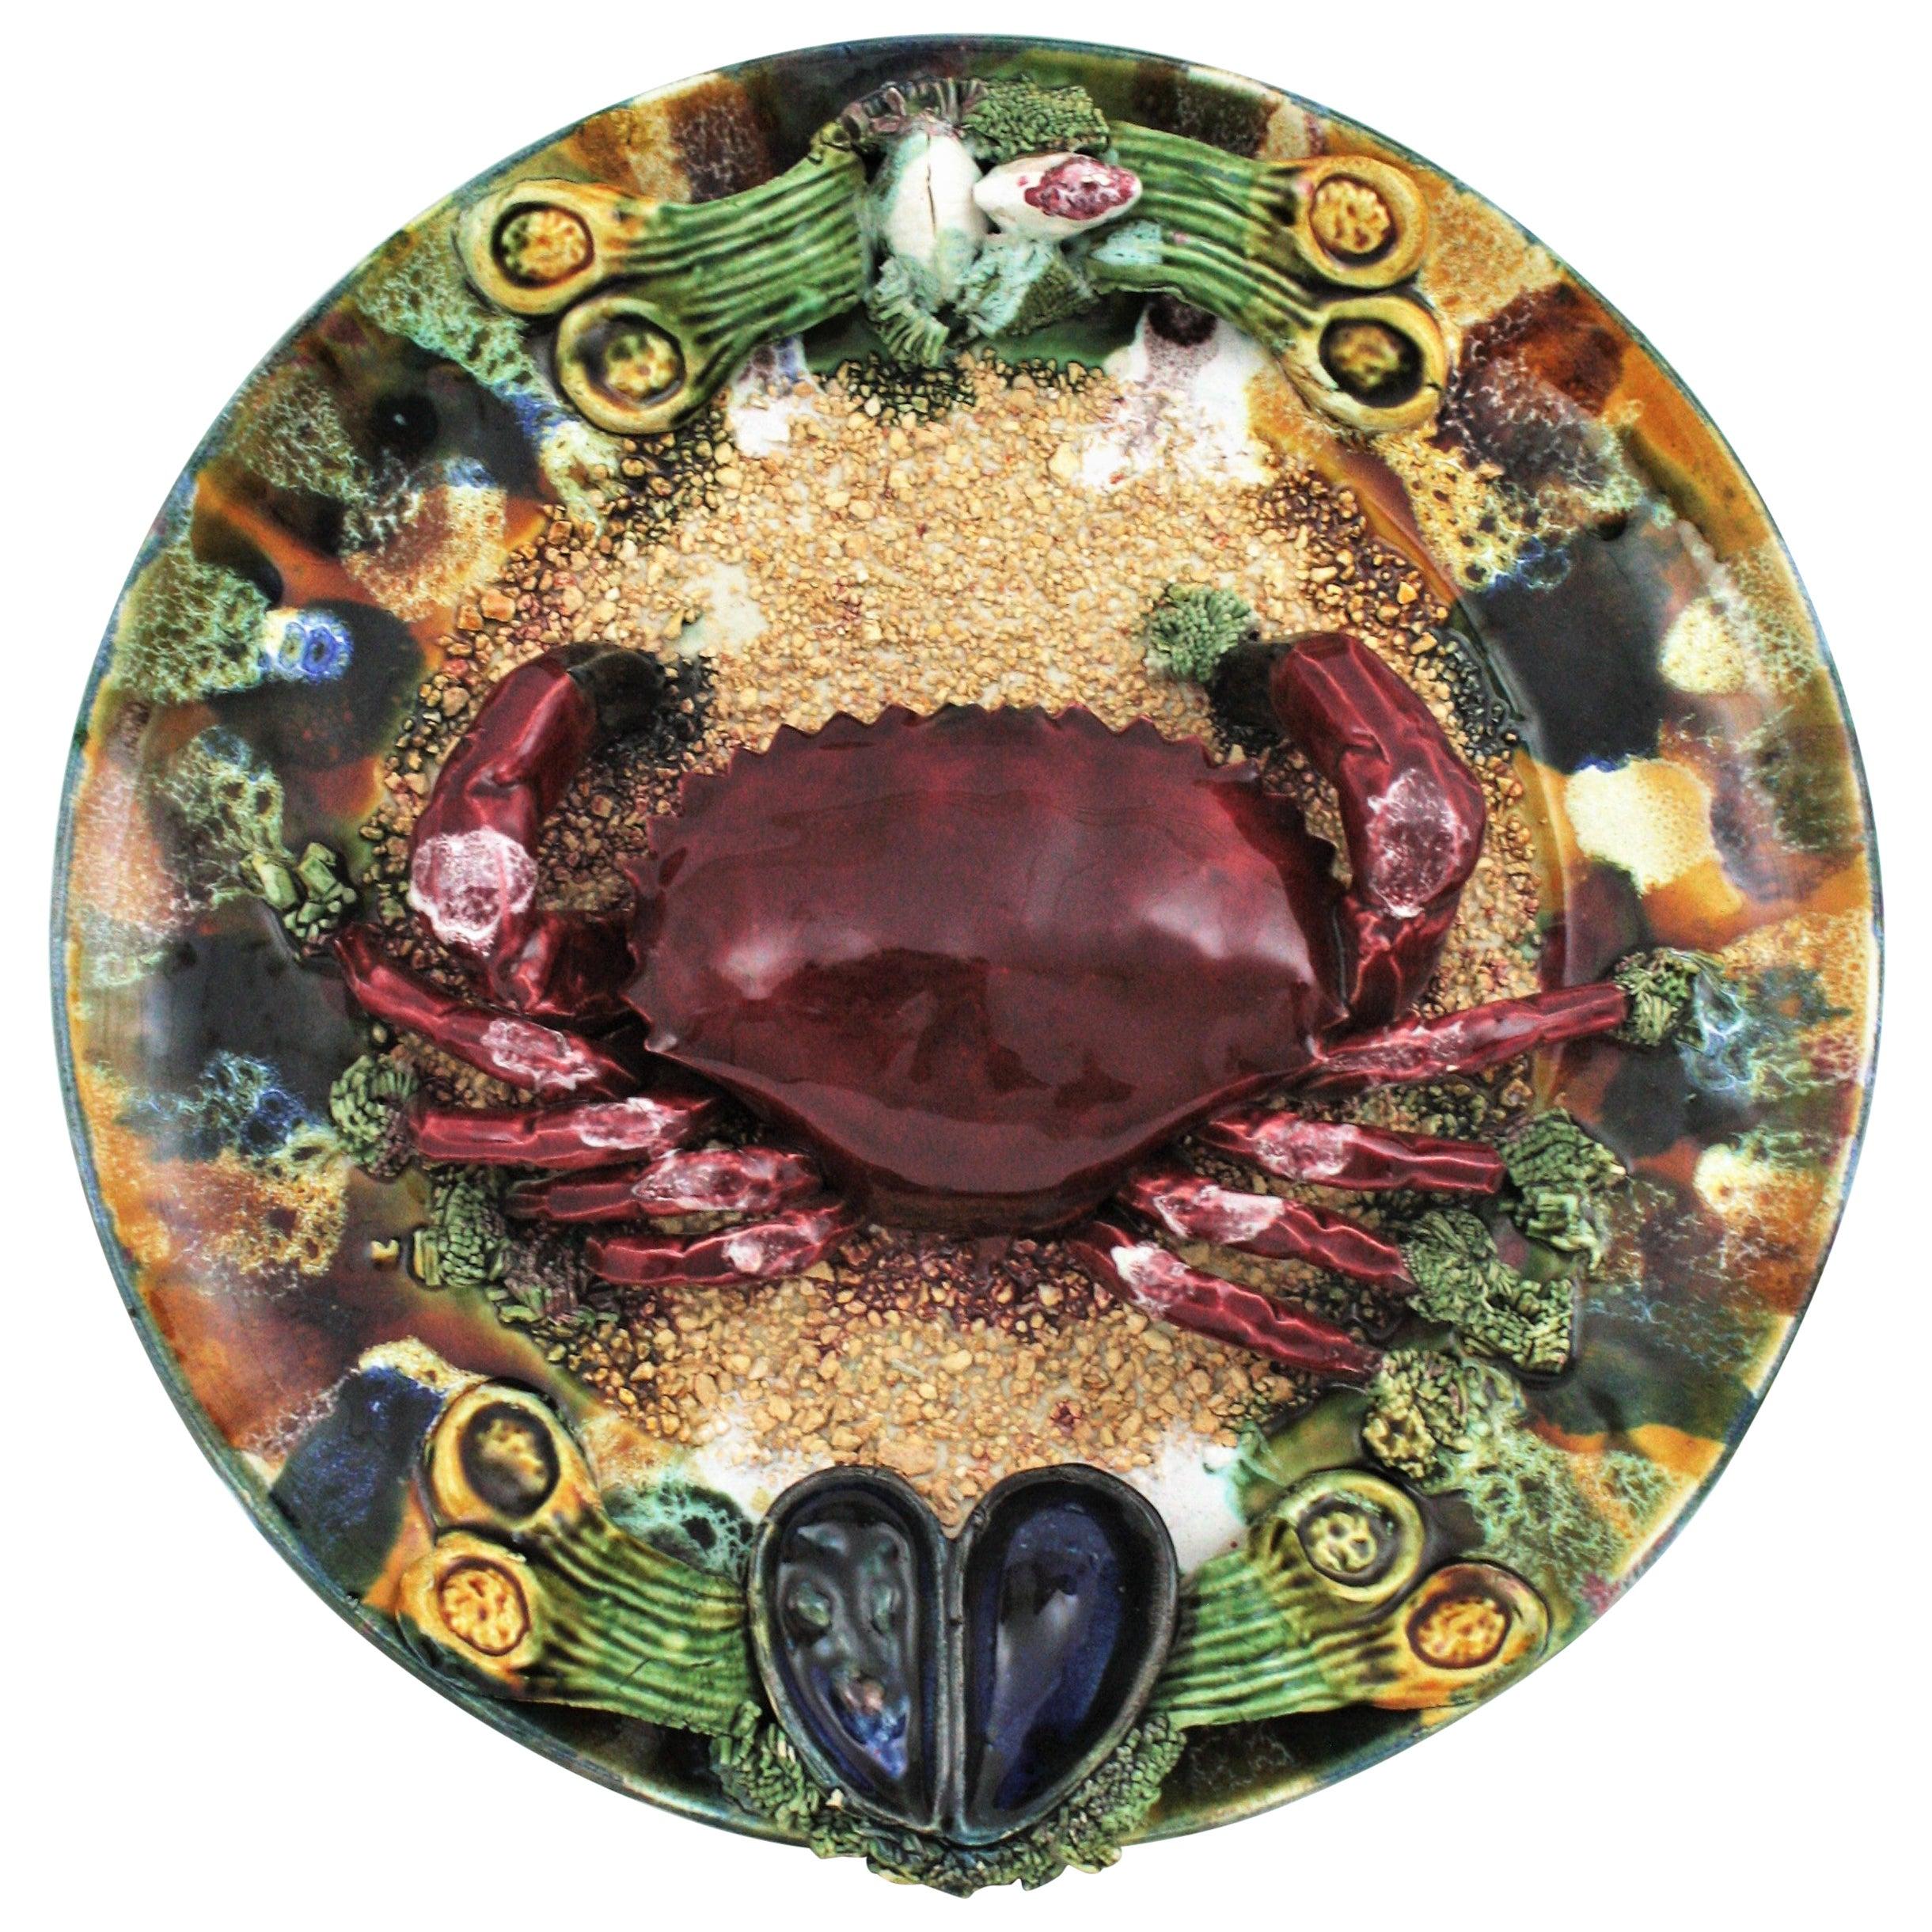 Extra Large Majolica Ceramic Trompe L' Oeil Wall Plate Crab Design